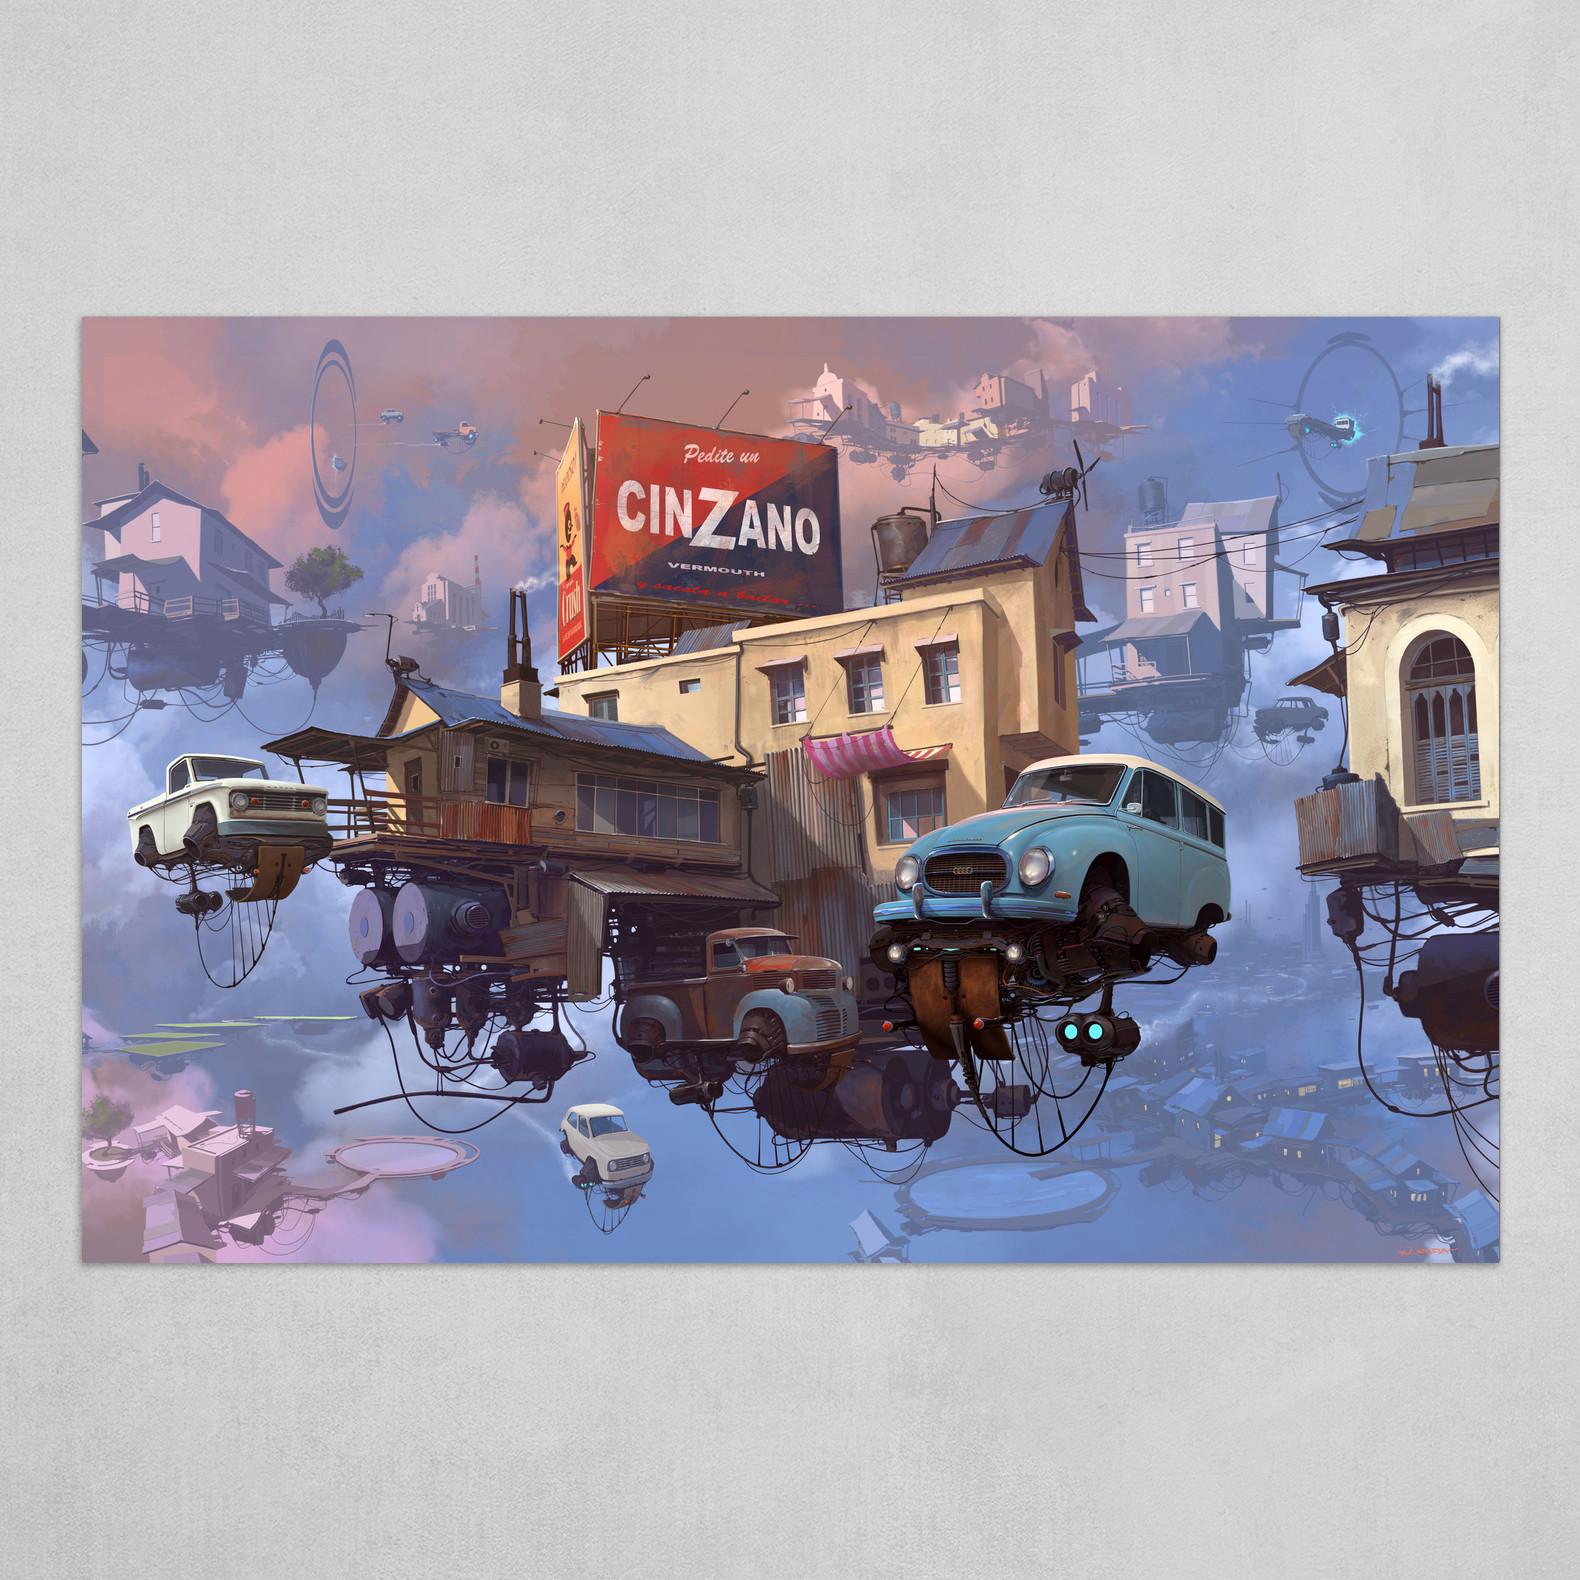 Cinzano Station